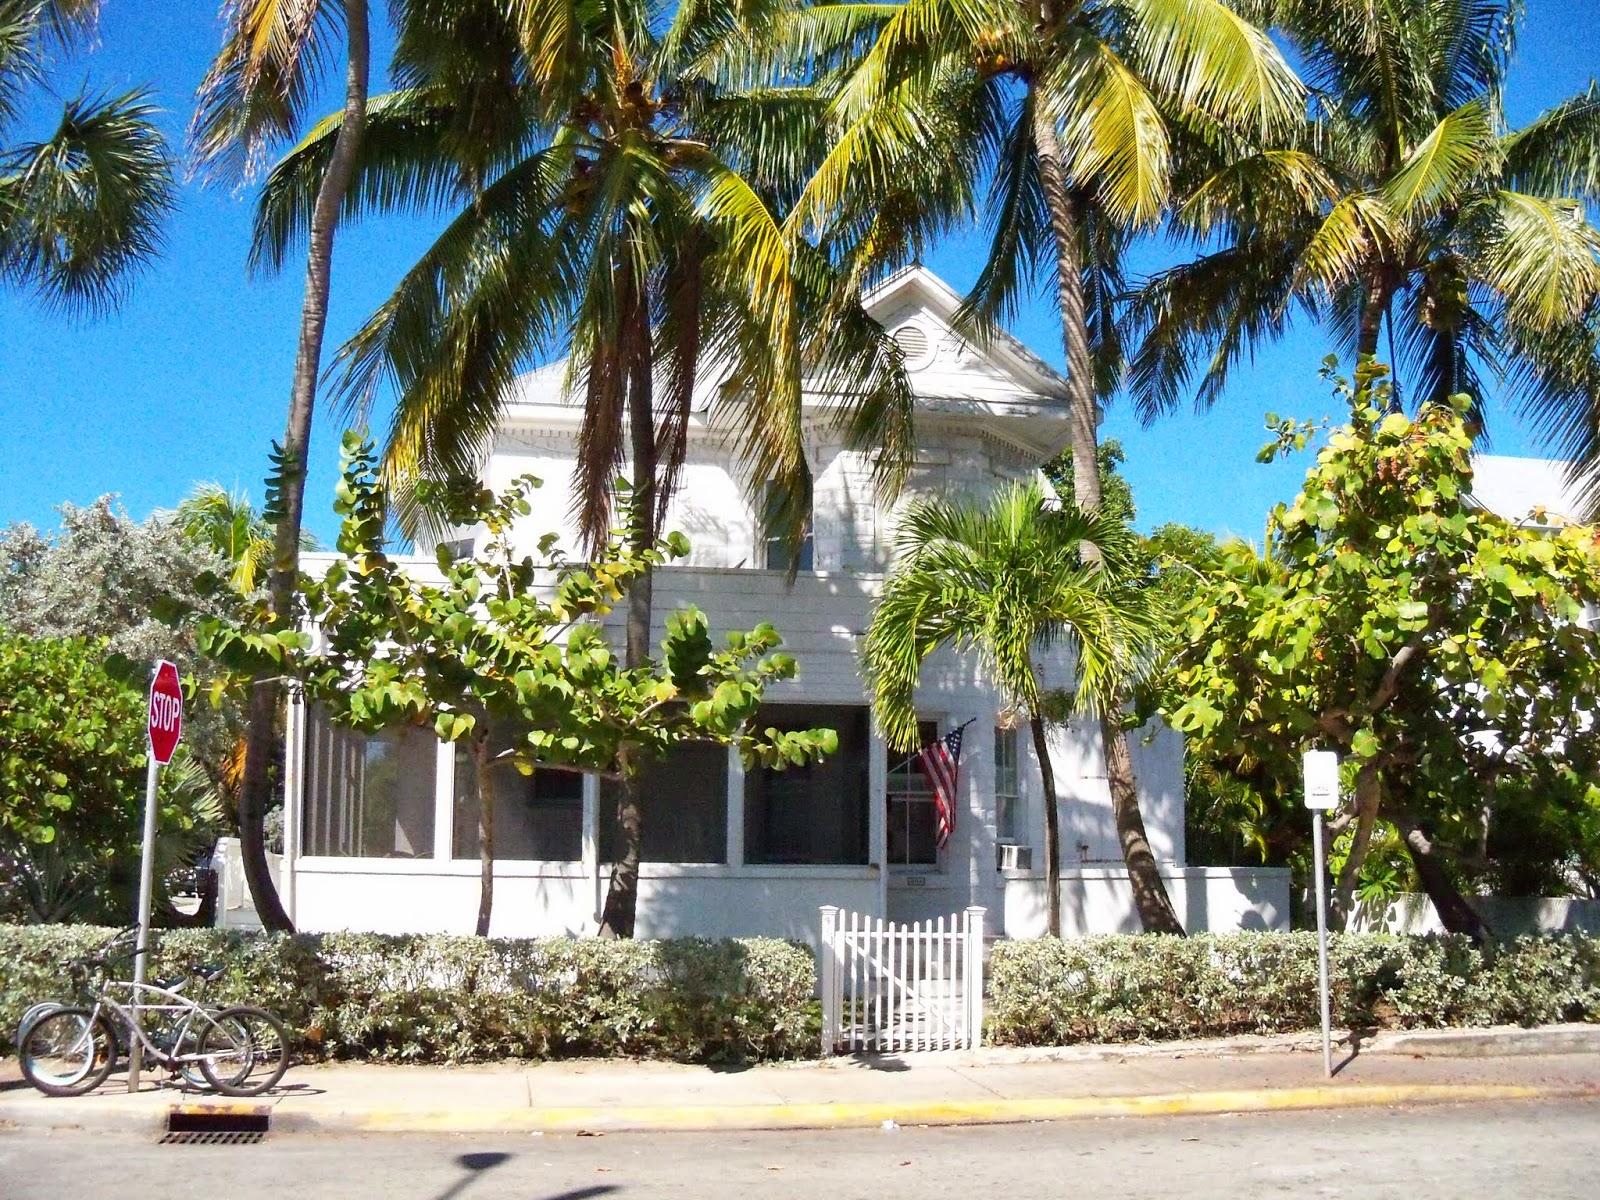 Key West Vacation - 116_5488.JPG